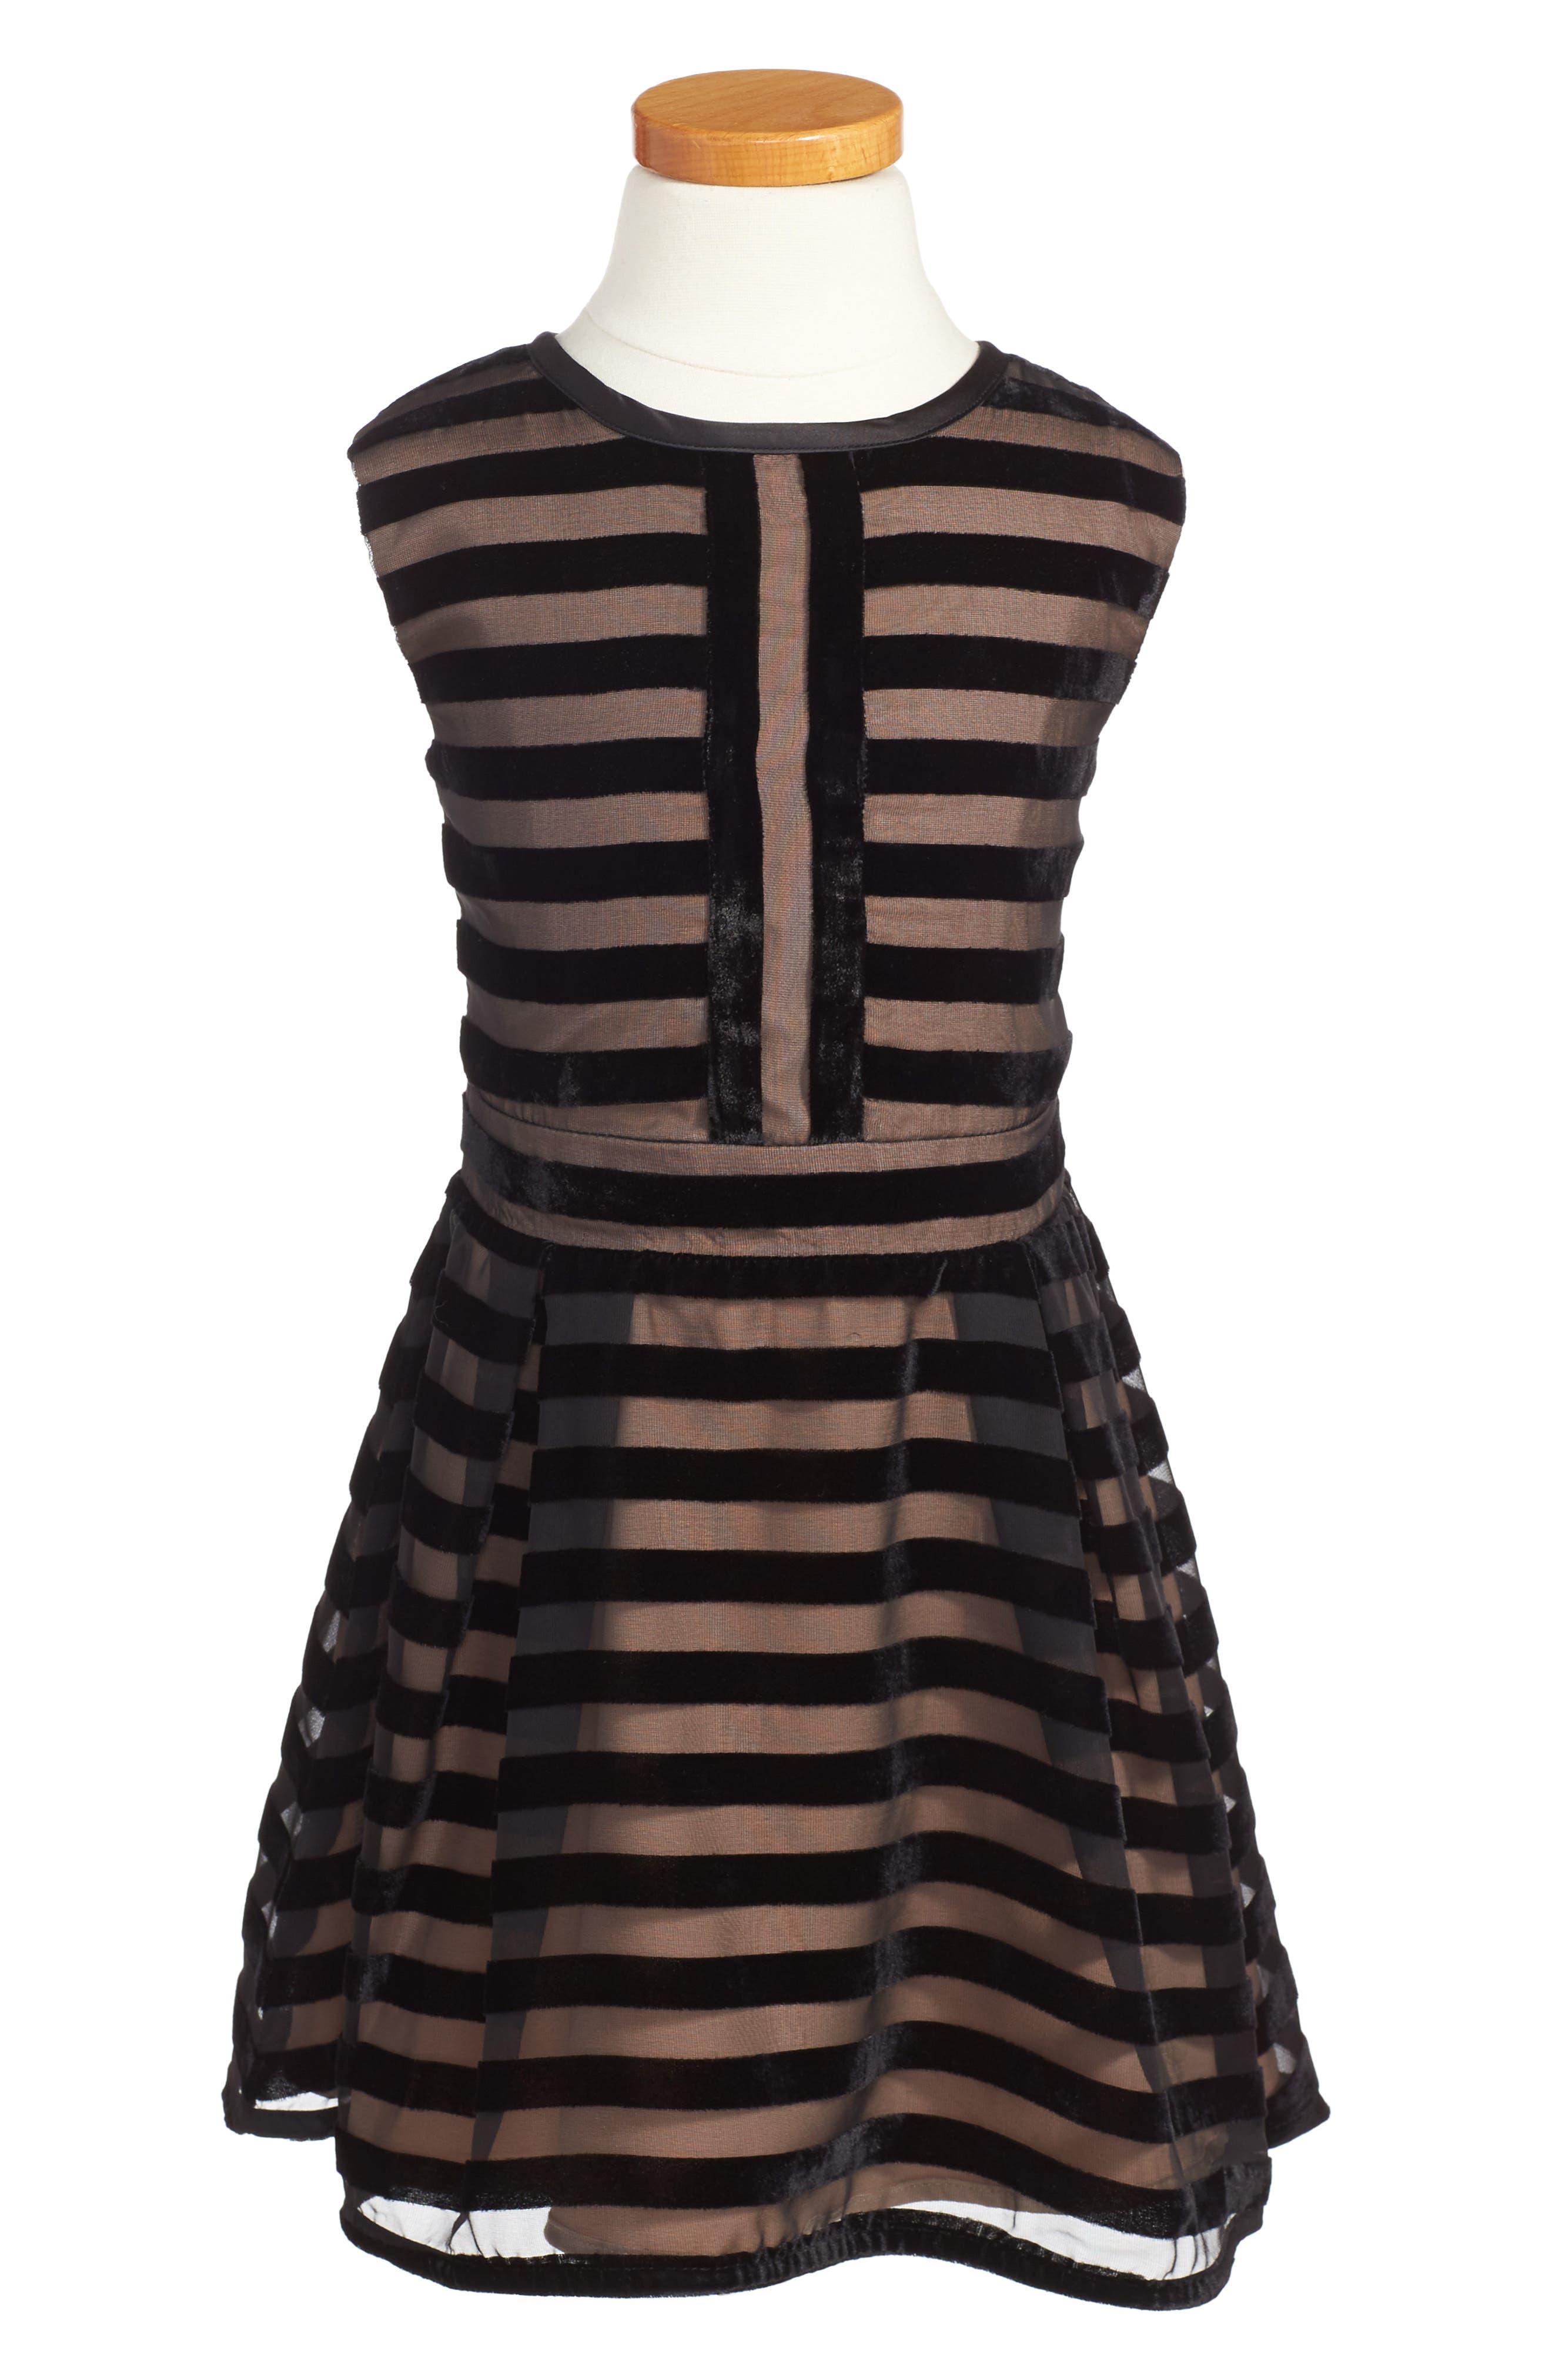 Main Image - Bardot Junior Linear Stripe Dress (Toddler Girls & Little Girls)